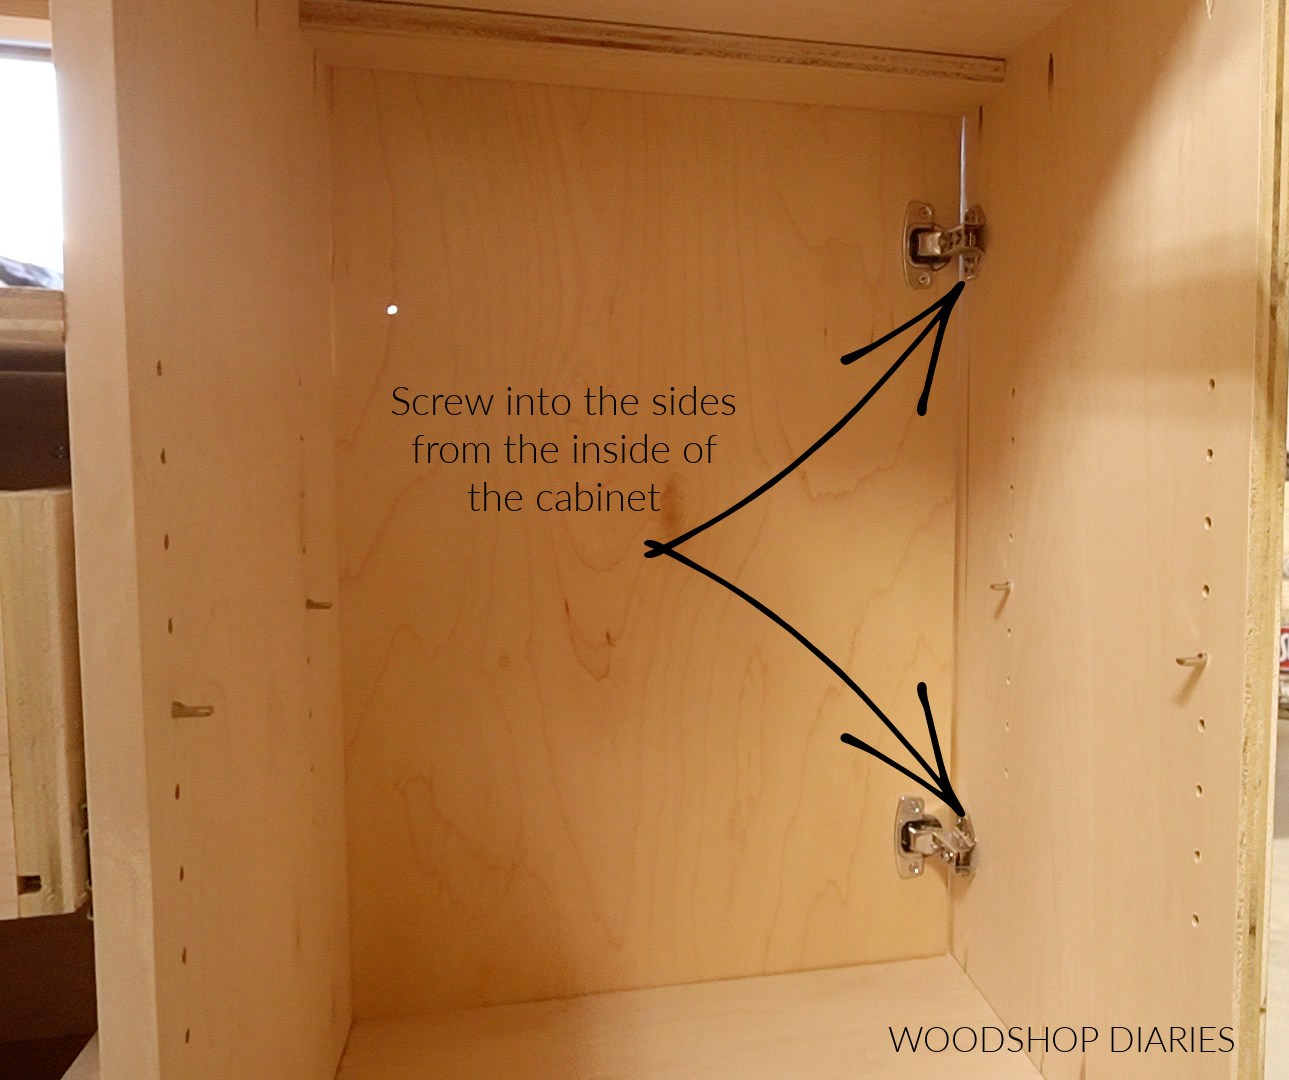 Inside cabinet view of hinges installed onto dresser